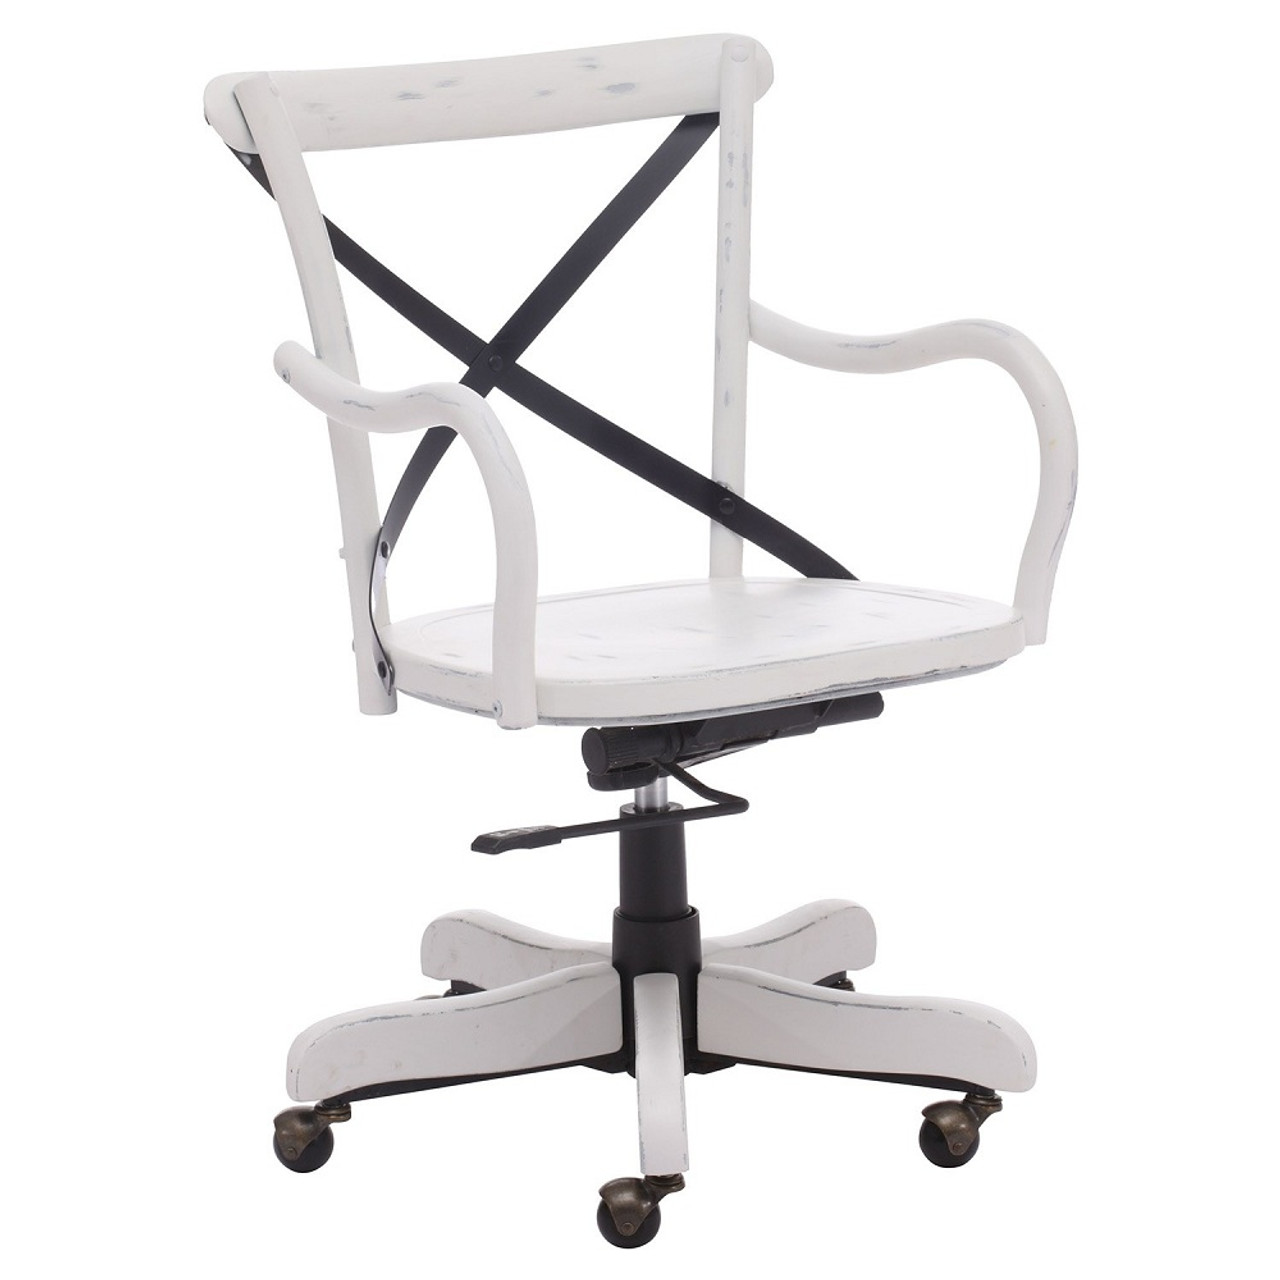 - Union Square Antique White Office Chair